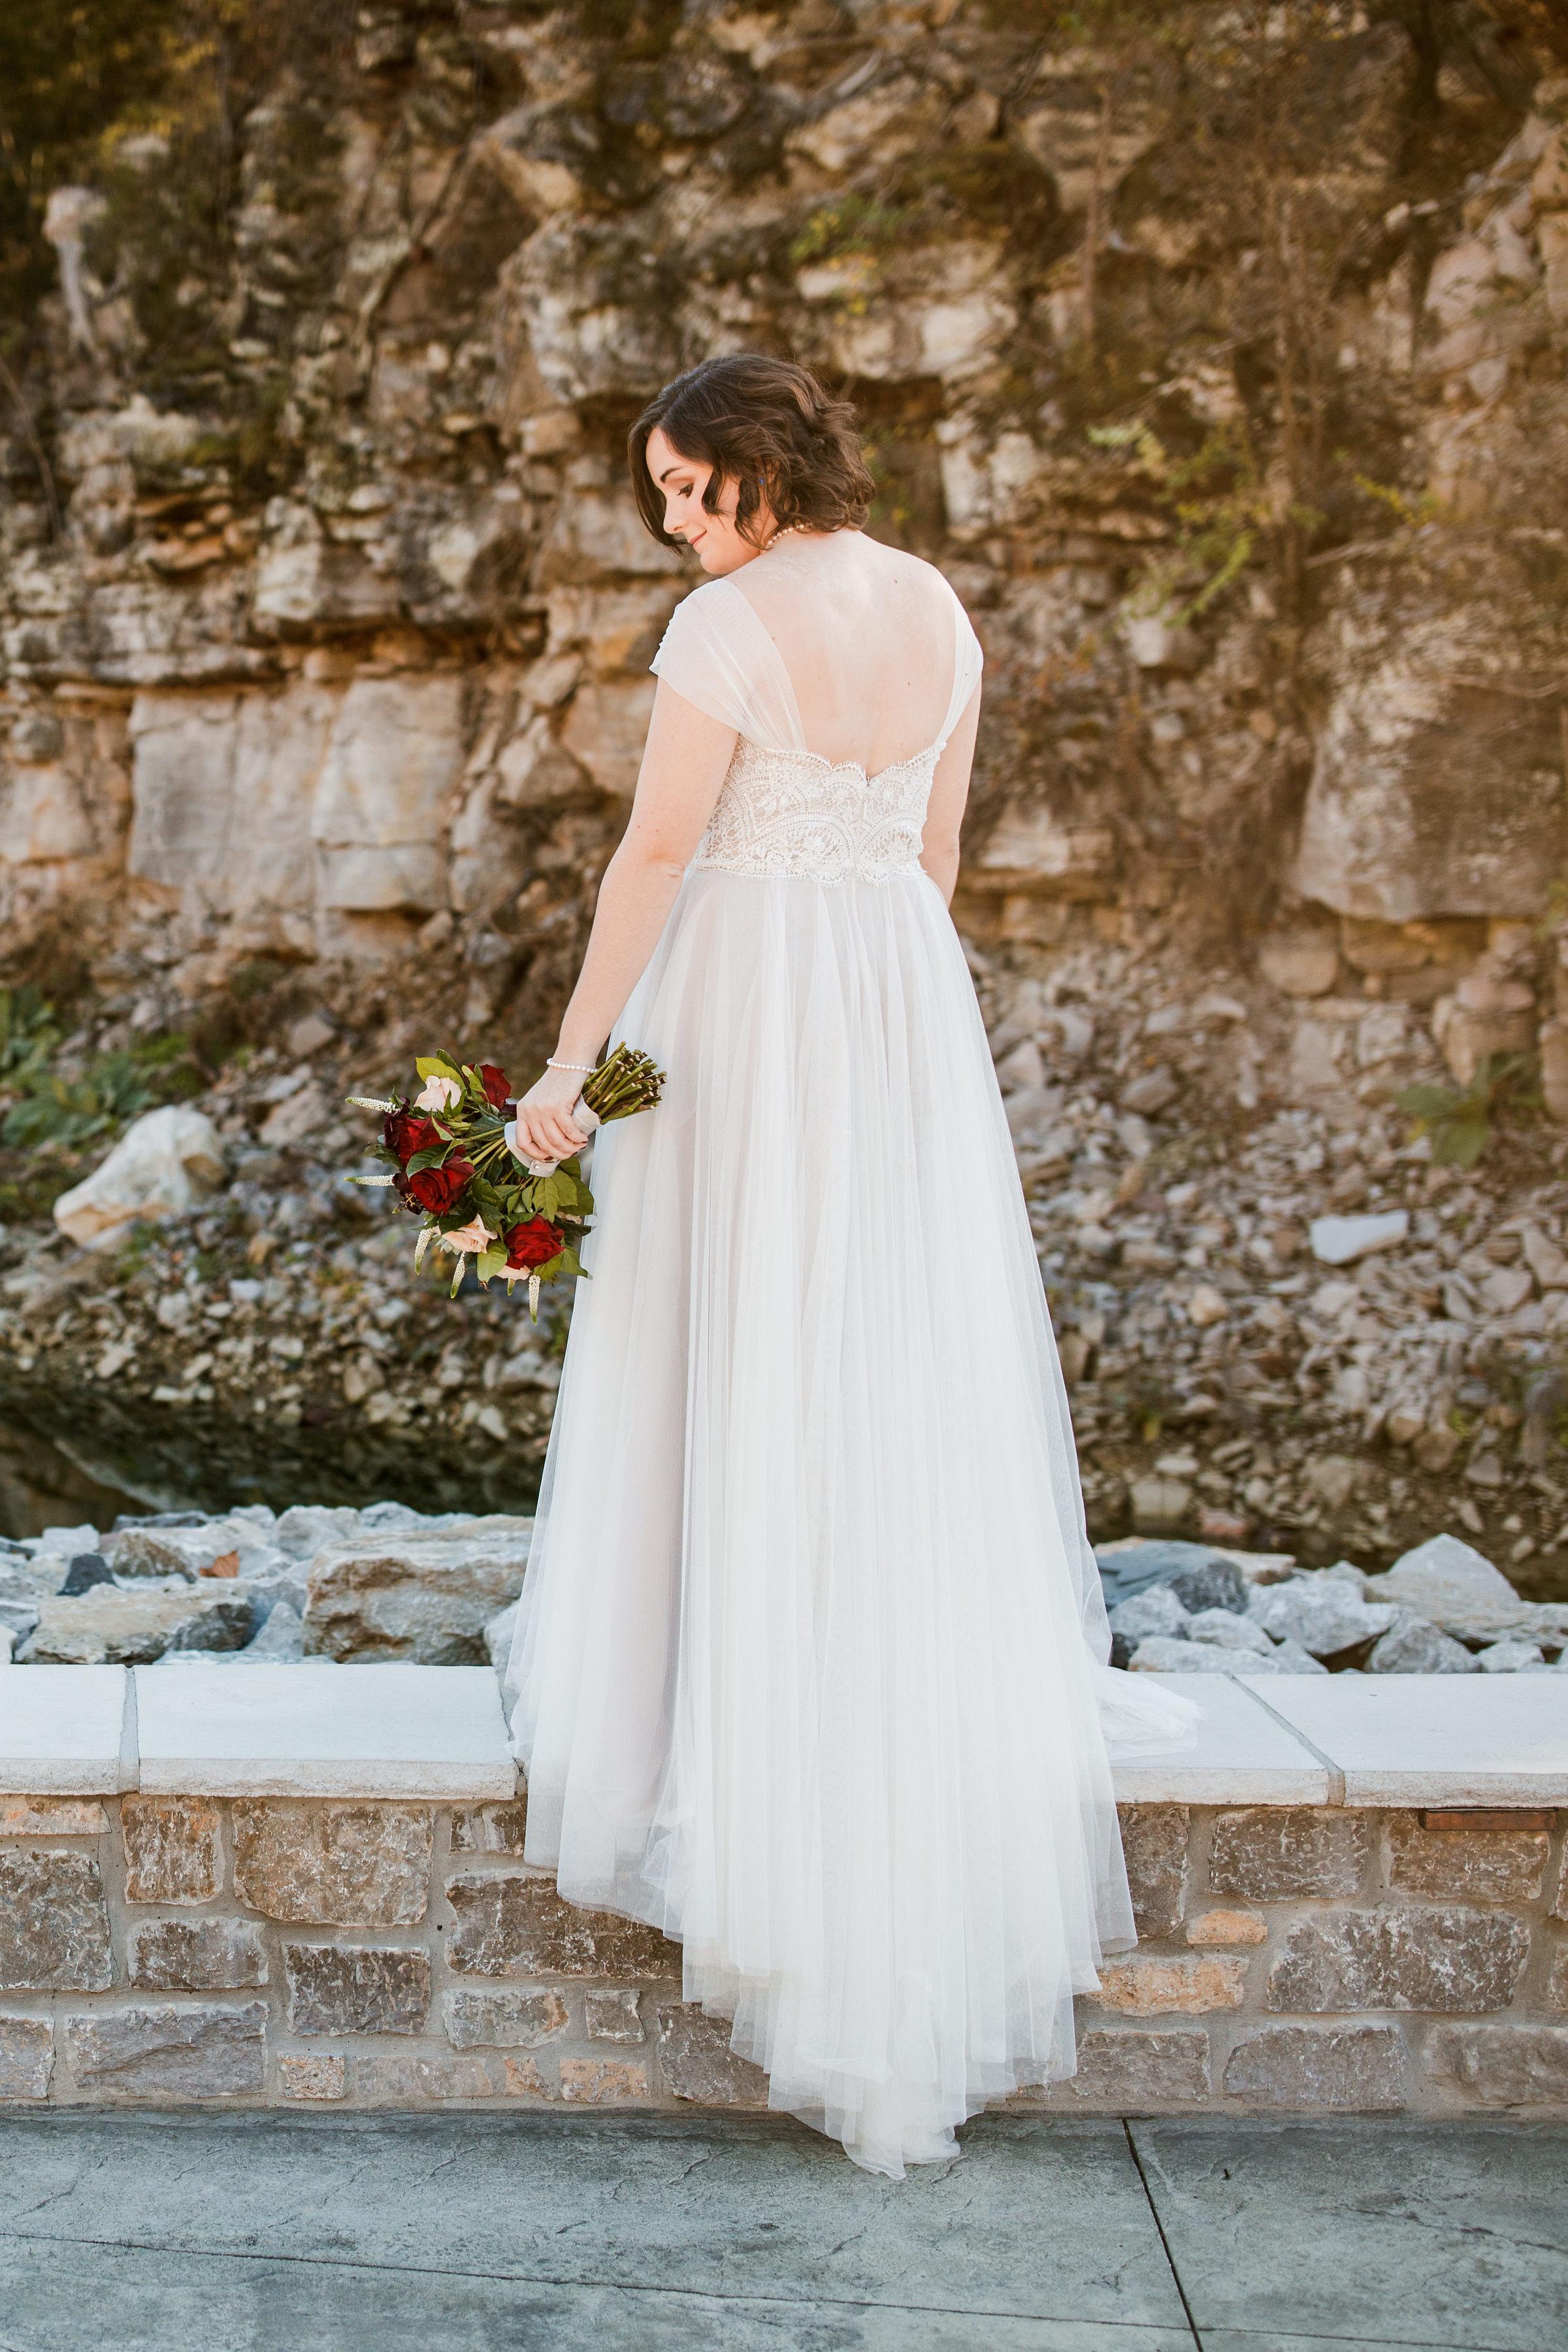 Graystone-Quarry-Wedding 25.jpg